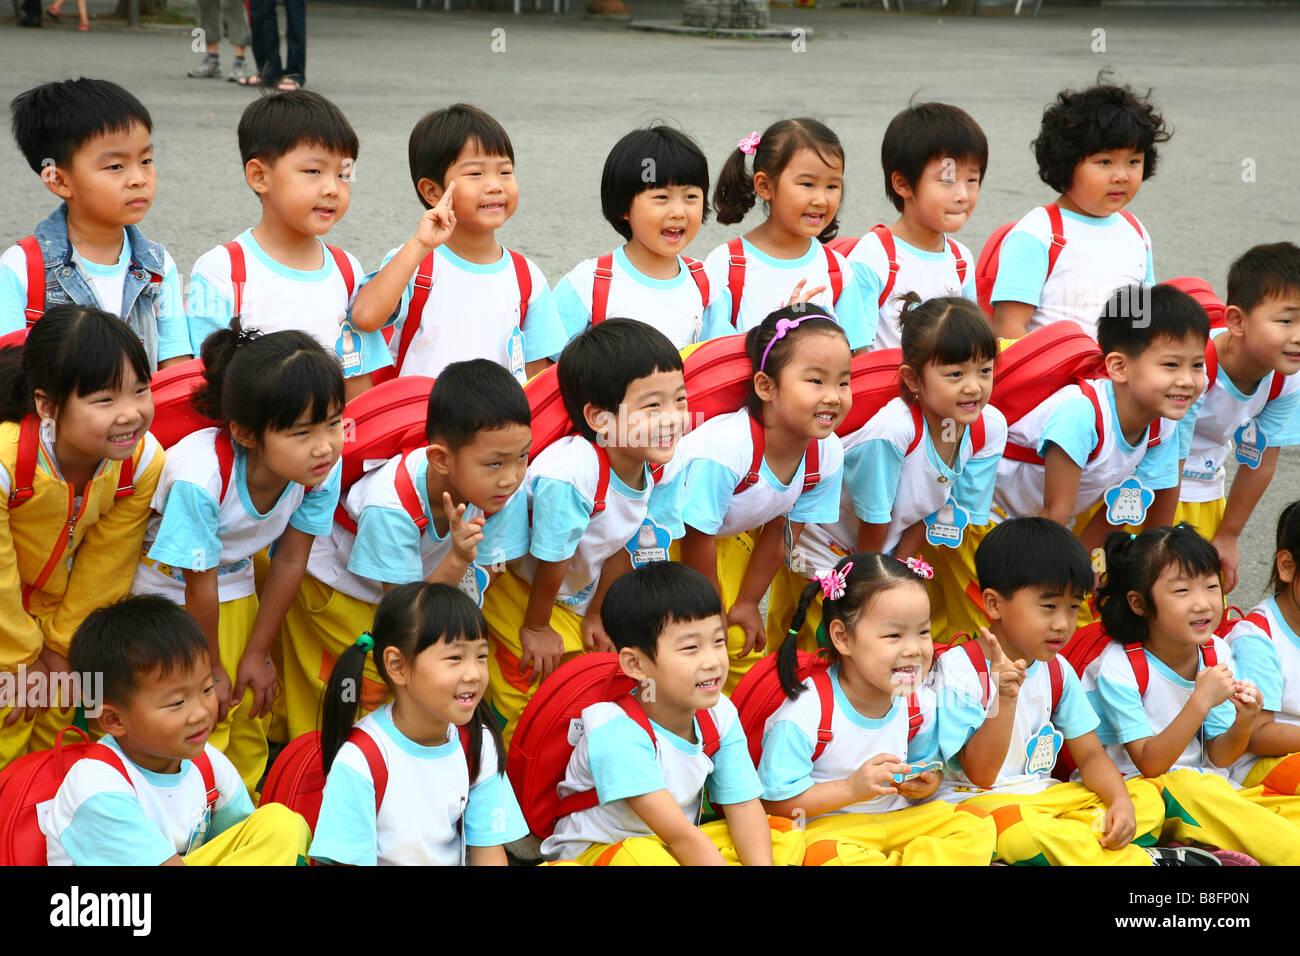 south korea school children stock photos south korea school